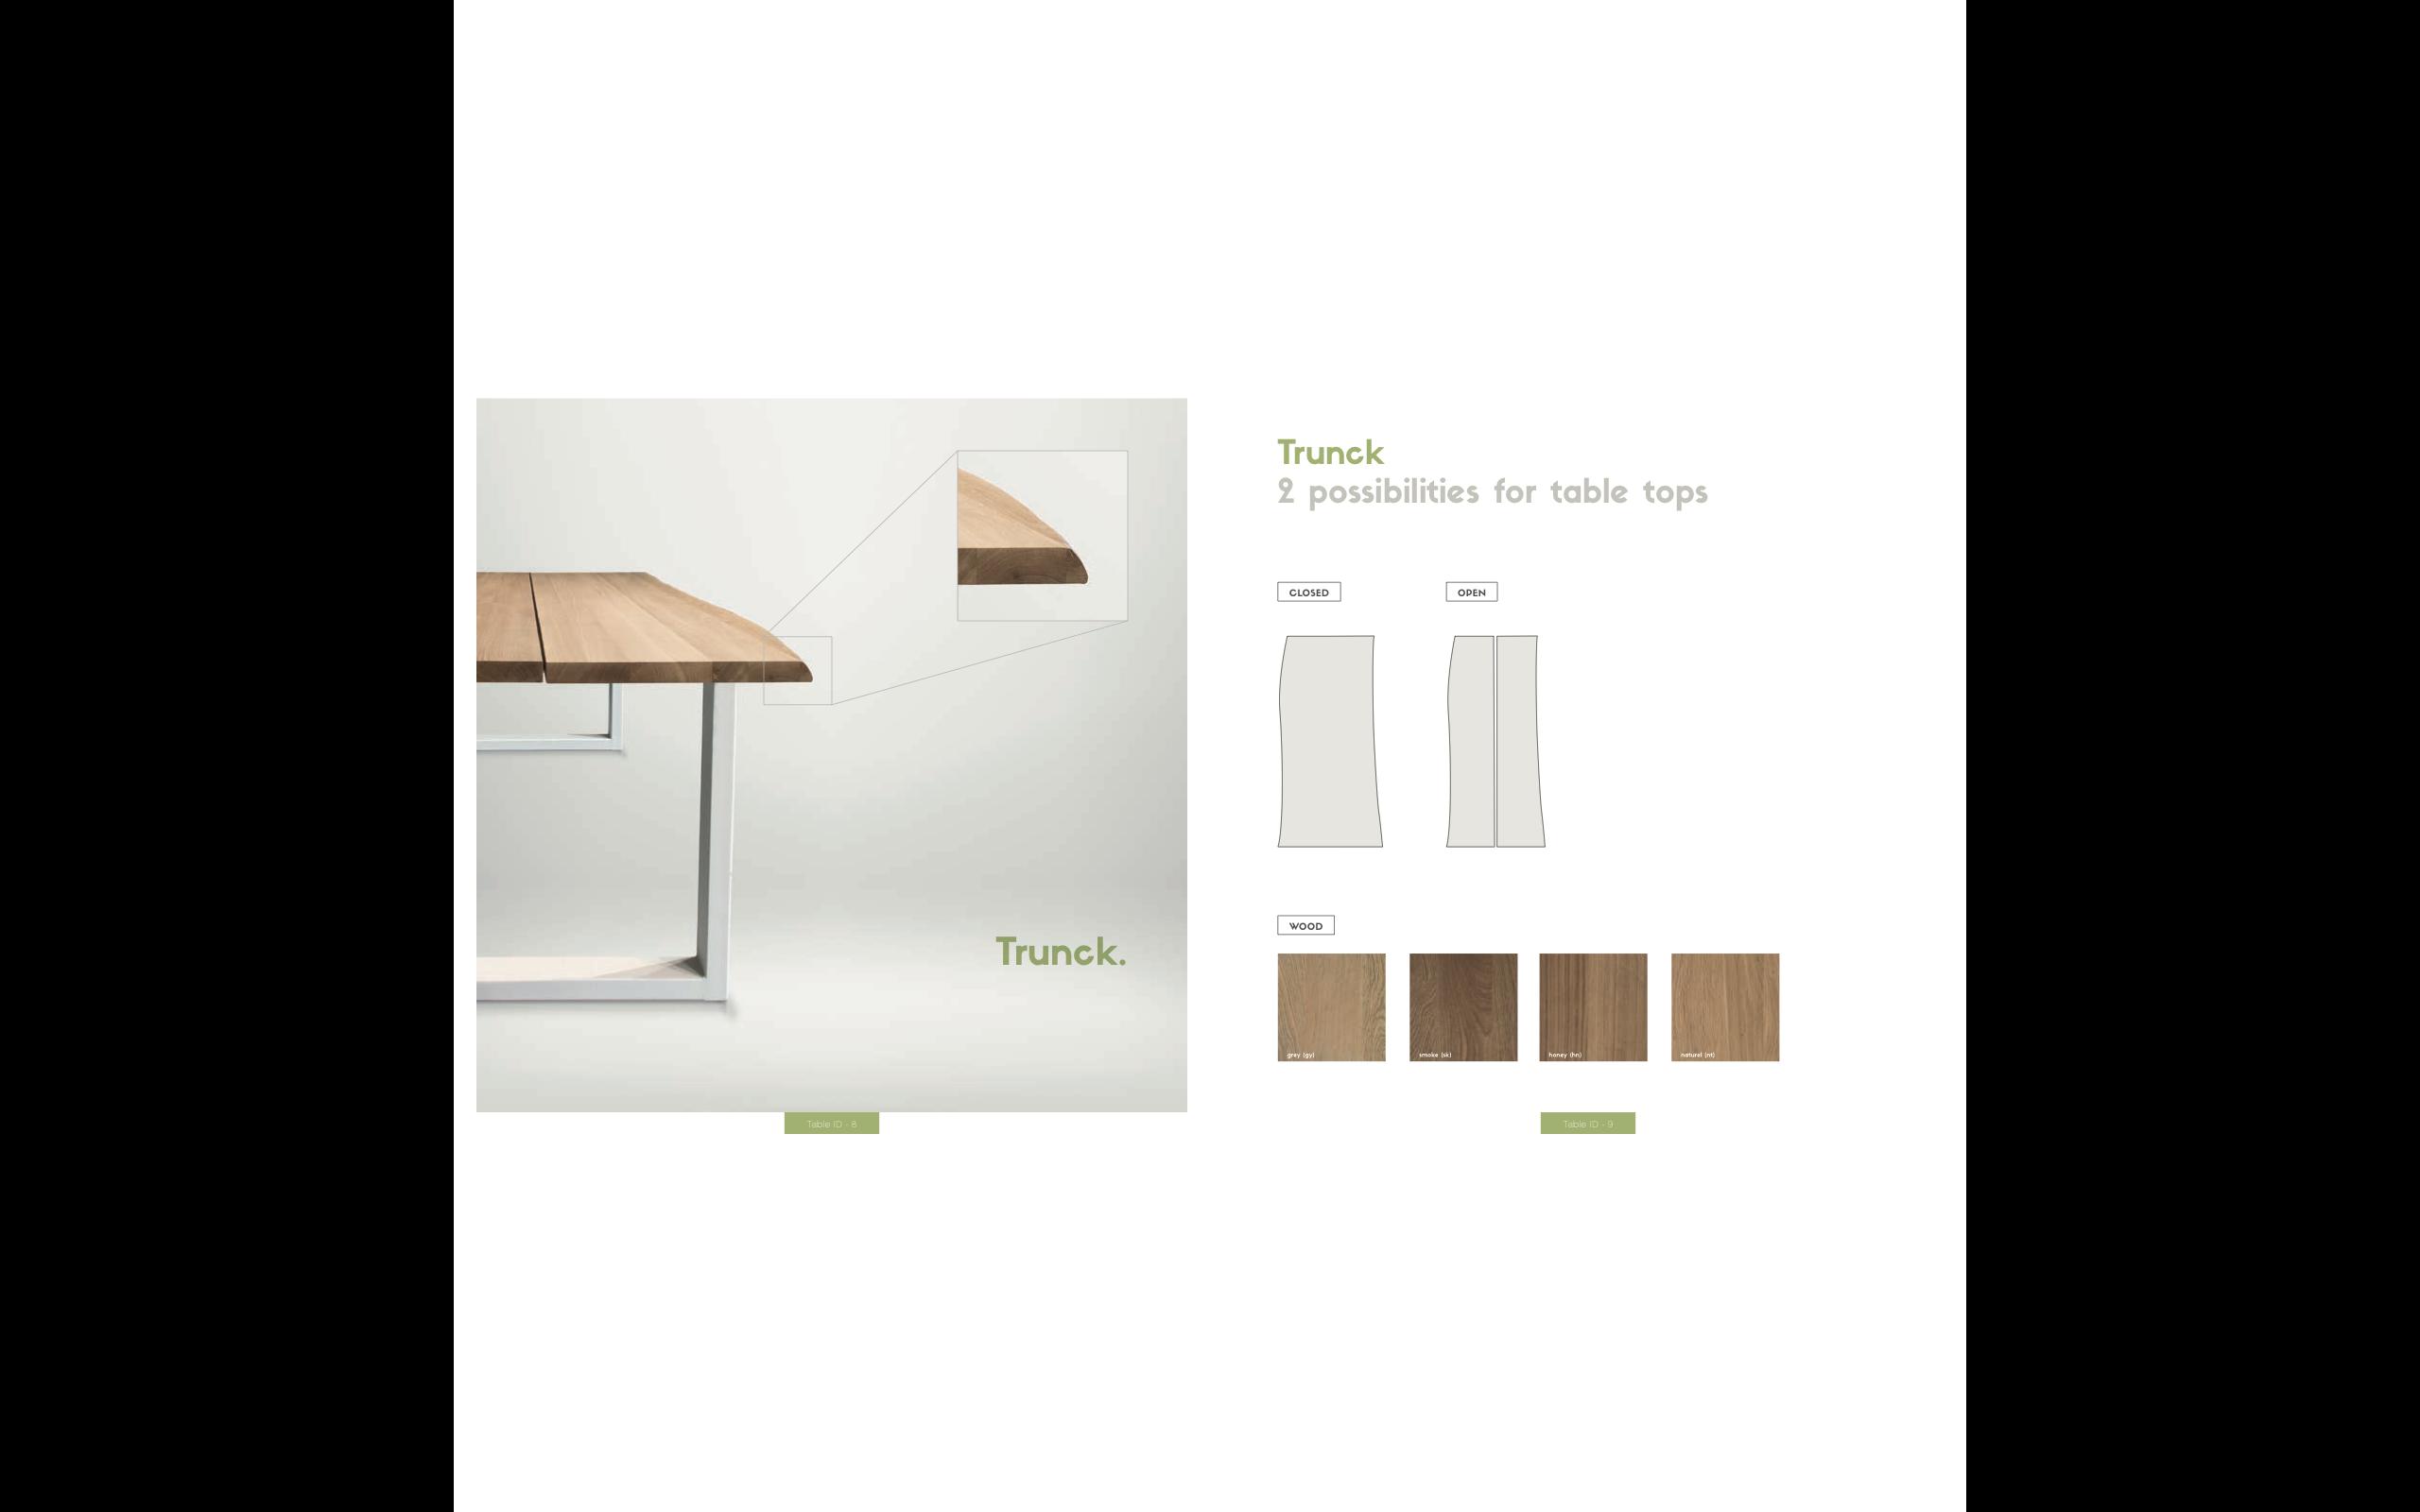 Nieuwe tafels zelf samenstellen eurotan for Tafel samenstellen